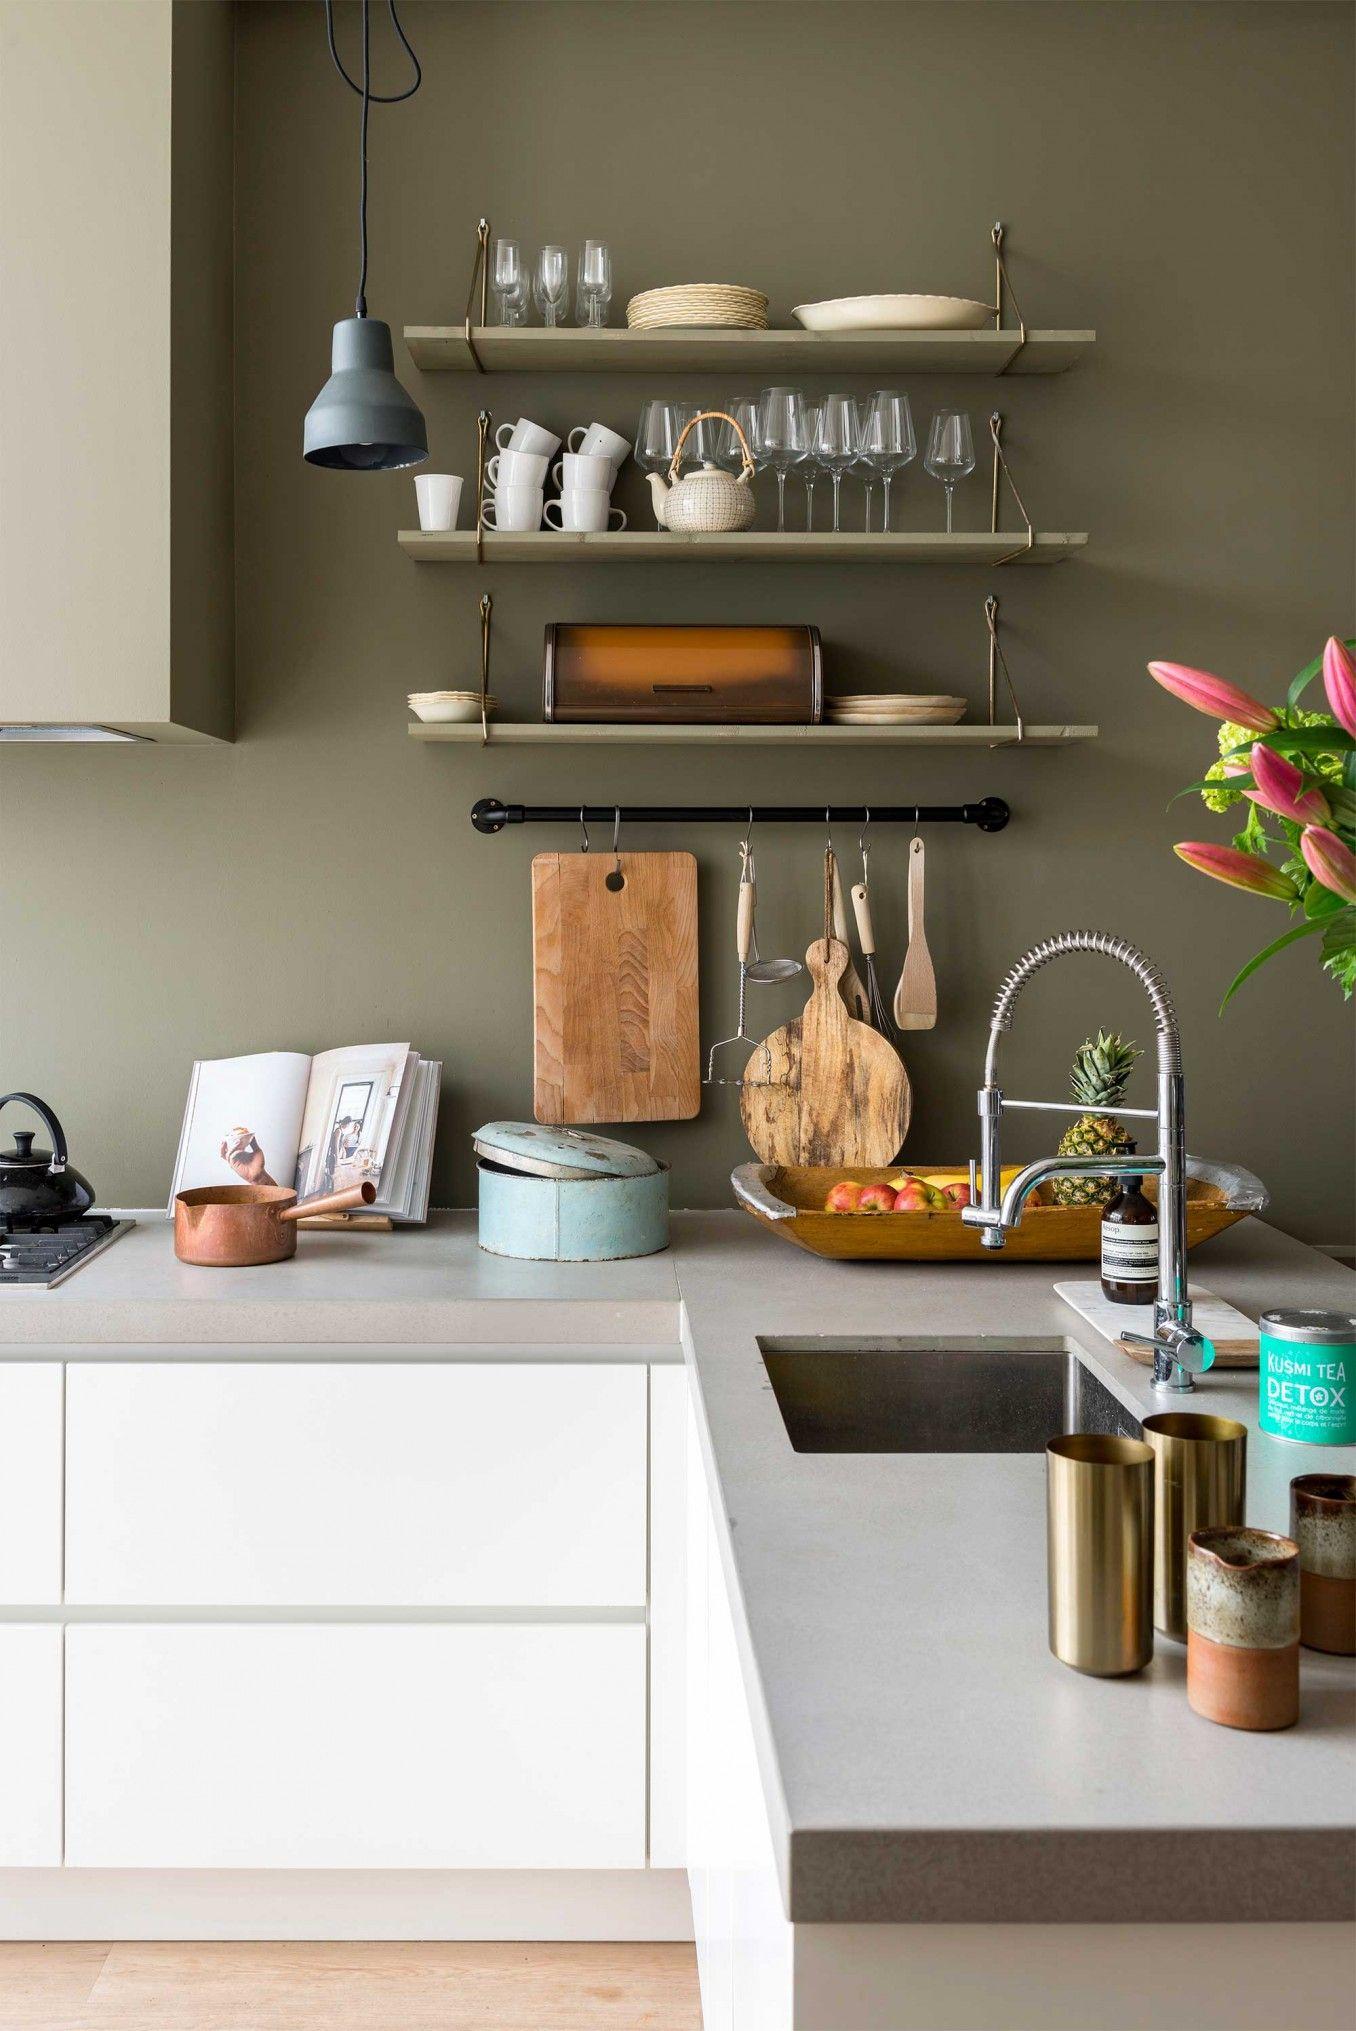 8 Keuken Groen Wit Keuken Idee Keuken Interieur Keuken Inspiratie